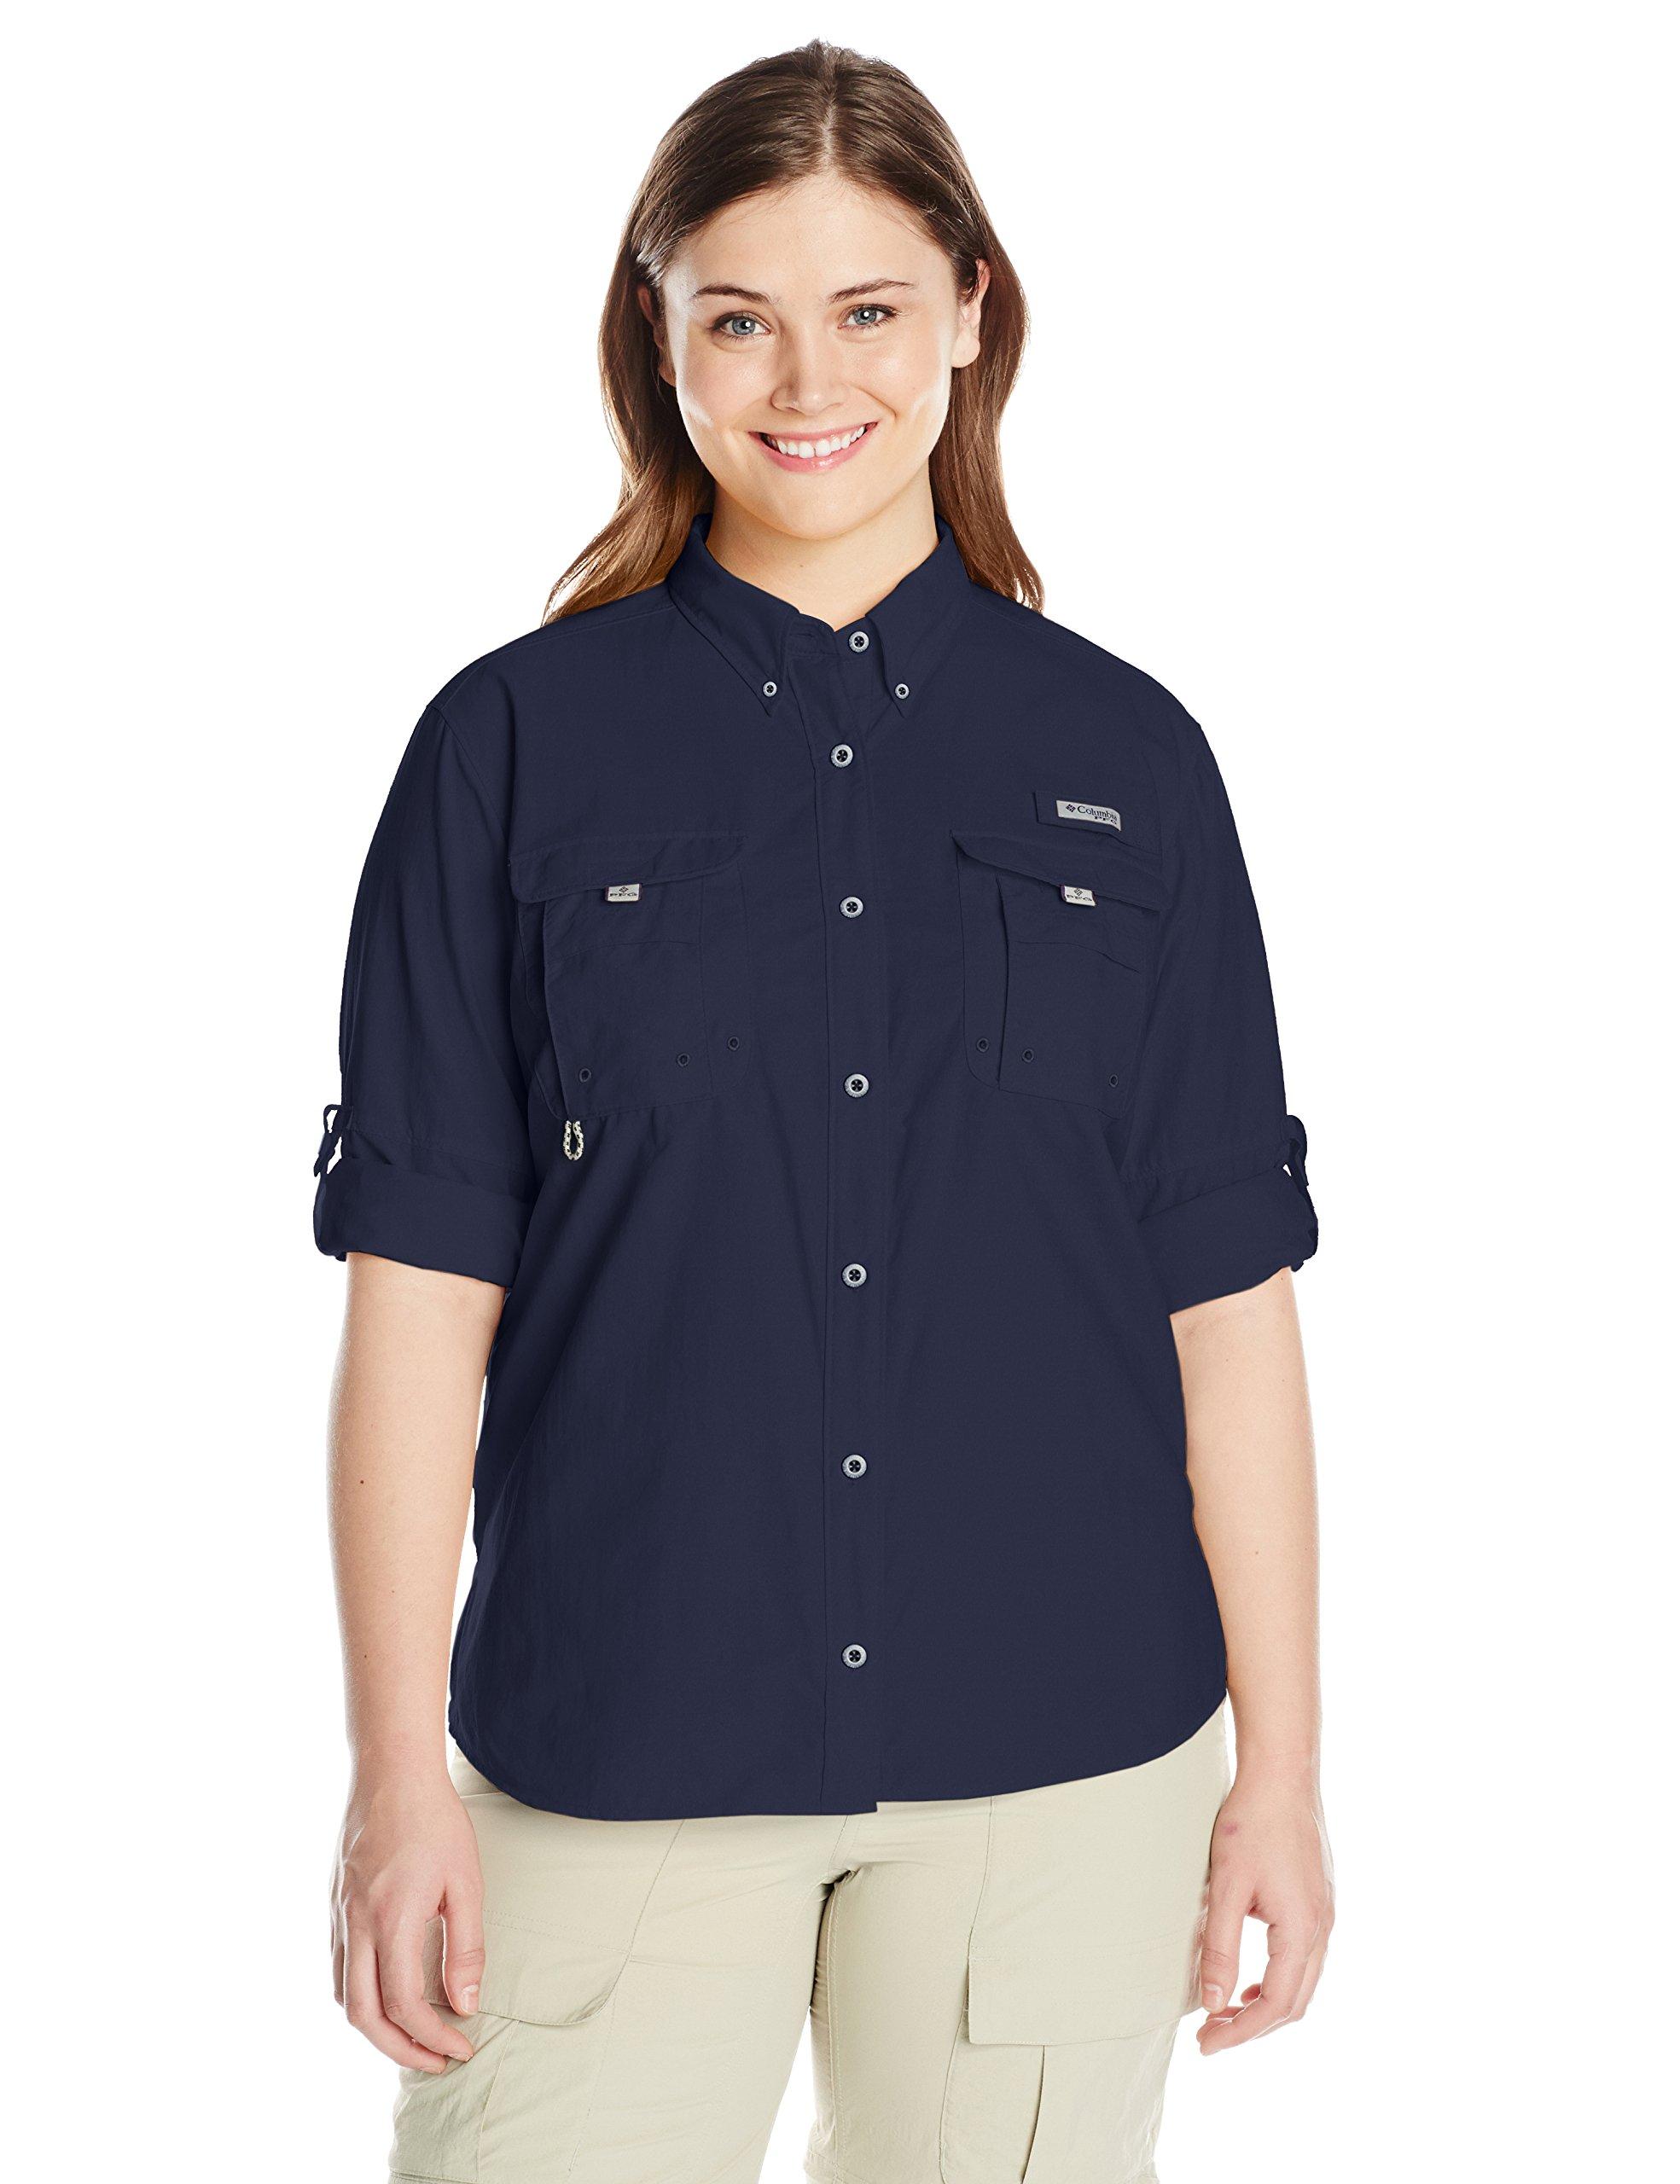 Columbia Sportswear Women's Plus Bahama Long Sleeve Shirt, Collegiate Navy, 1X